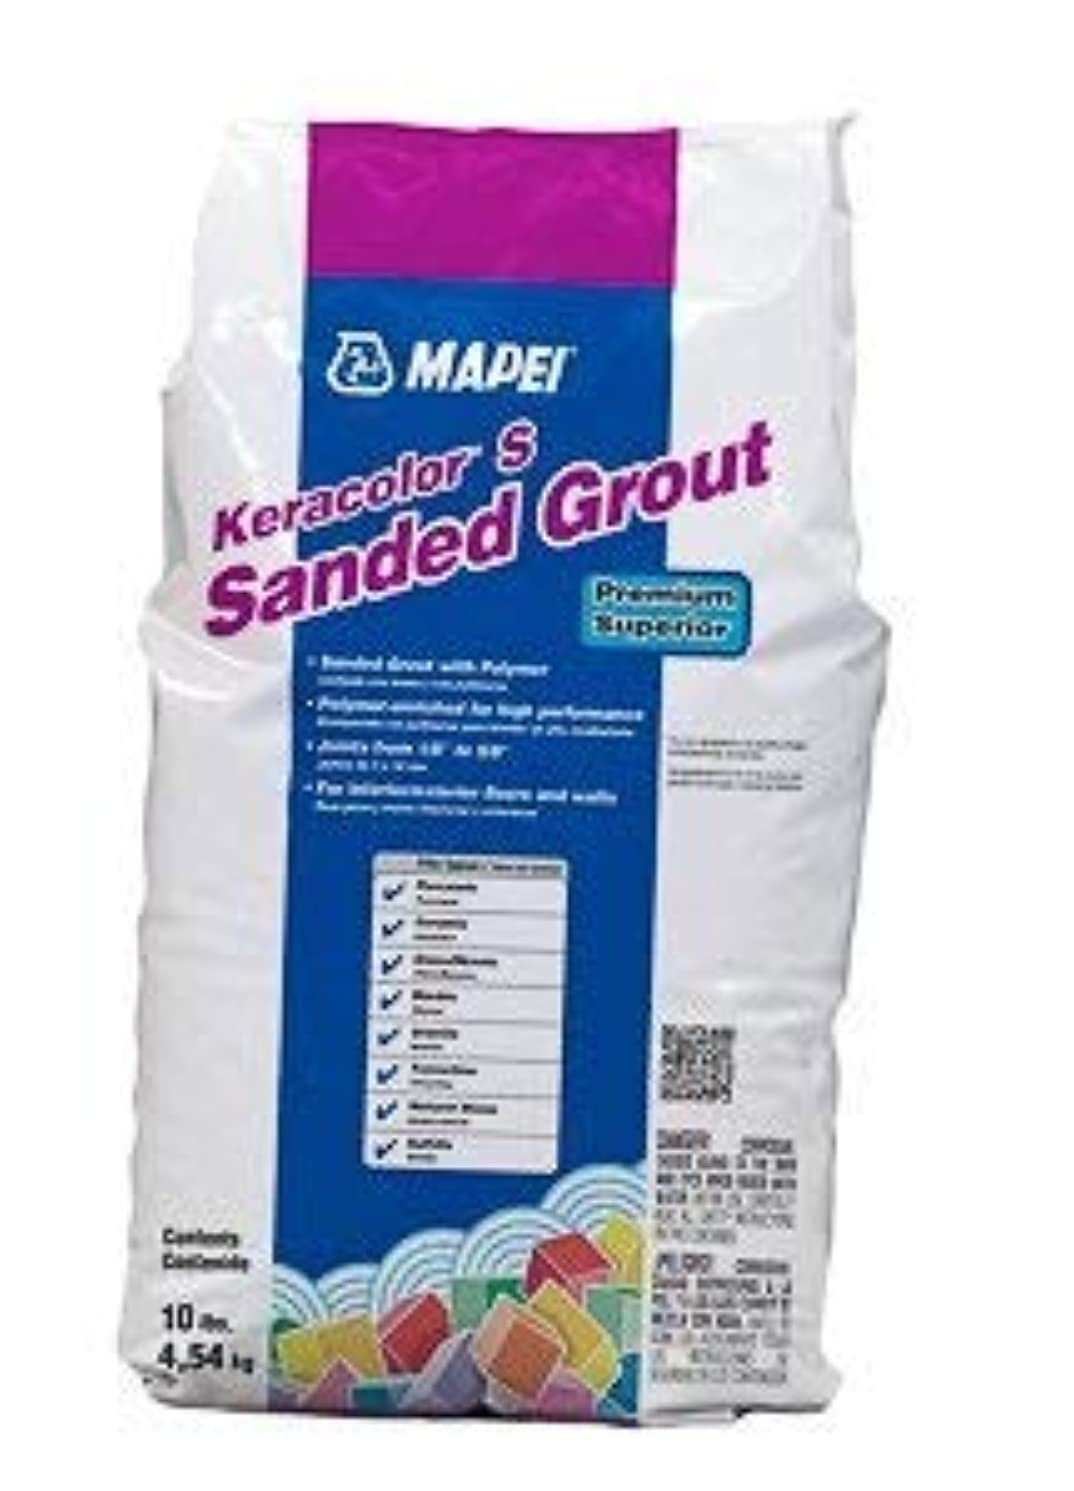 MAPEI Keracolor S Sanded Powder Grout - 10LB/Bag - Premium Superior (00 White)